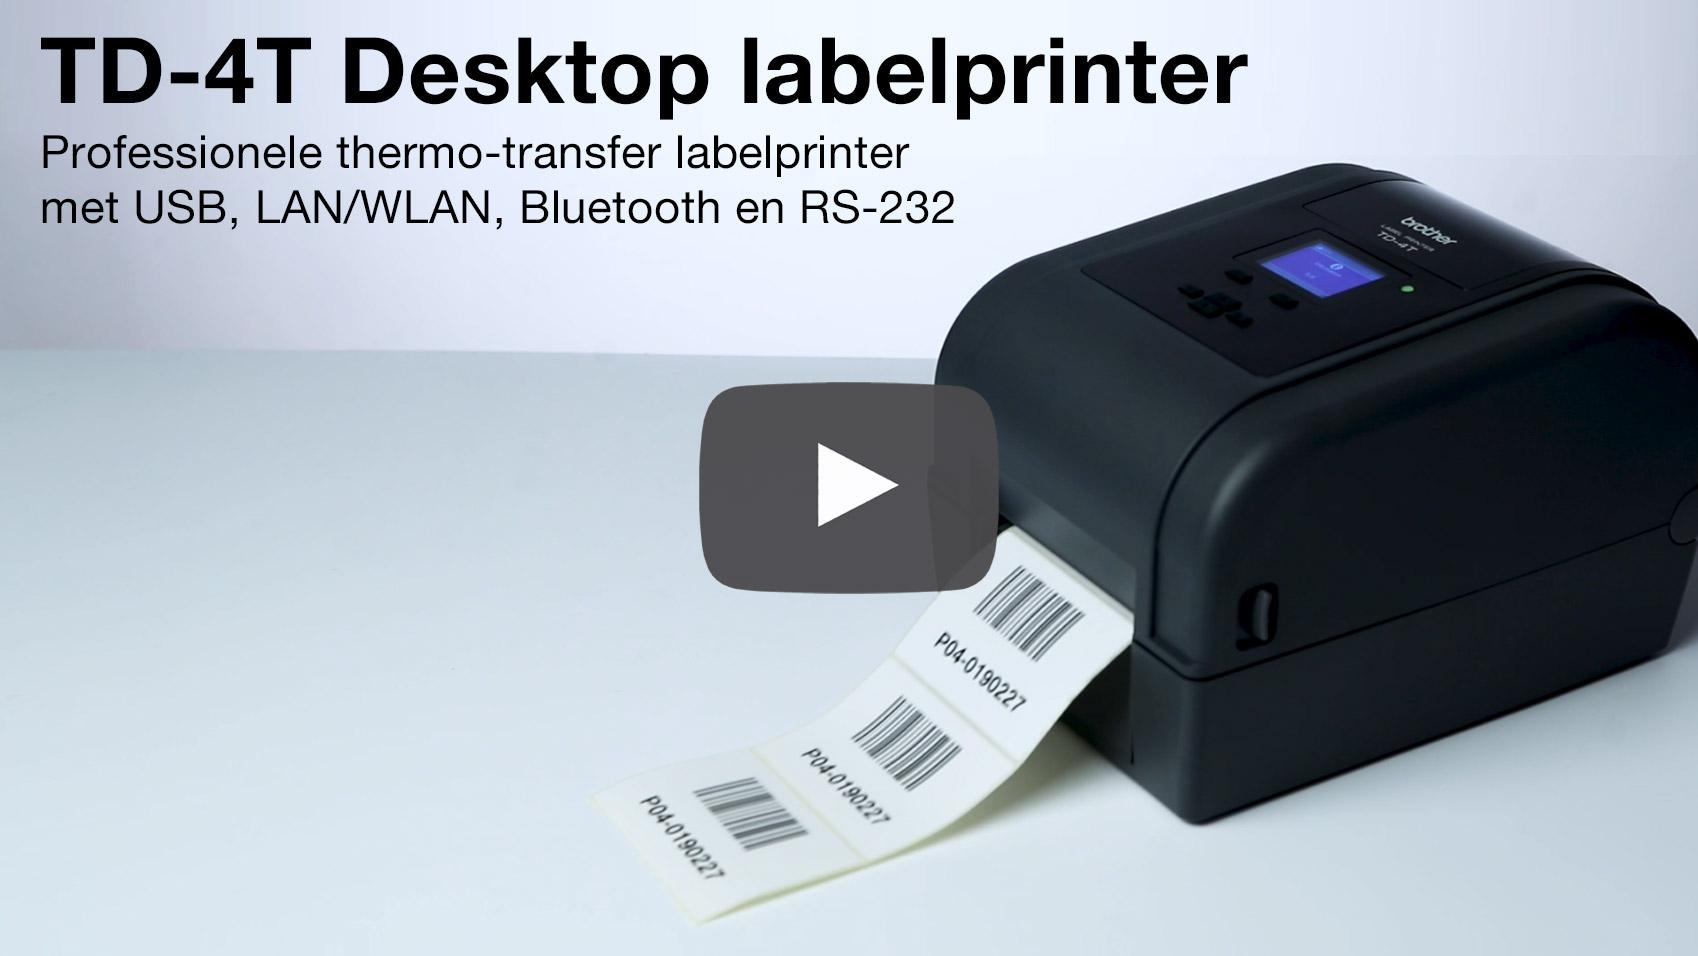 TD-4650TNWBR Professionele thermo-transfer labelprinter met bekabelde/draadloze netwerkverbinding en Bluetooth 6